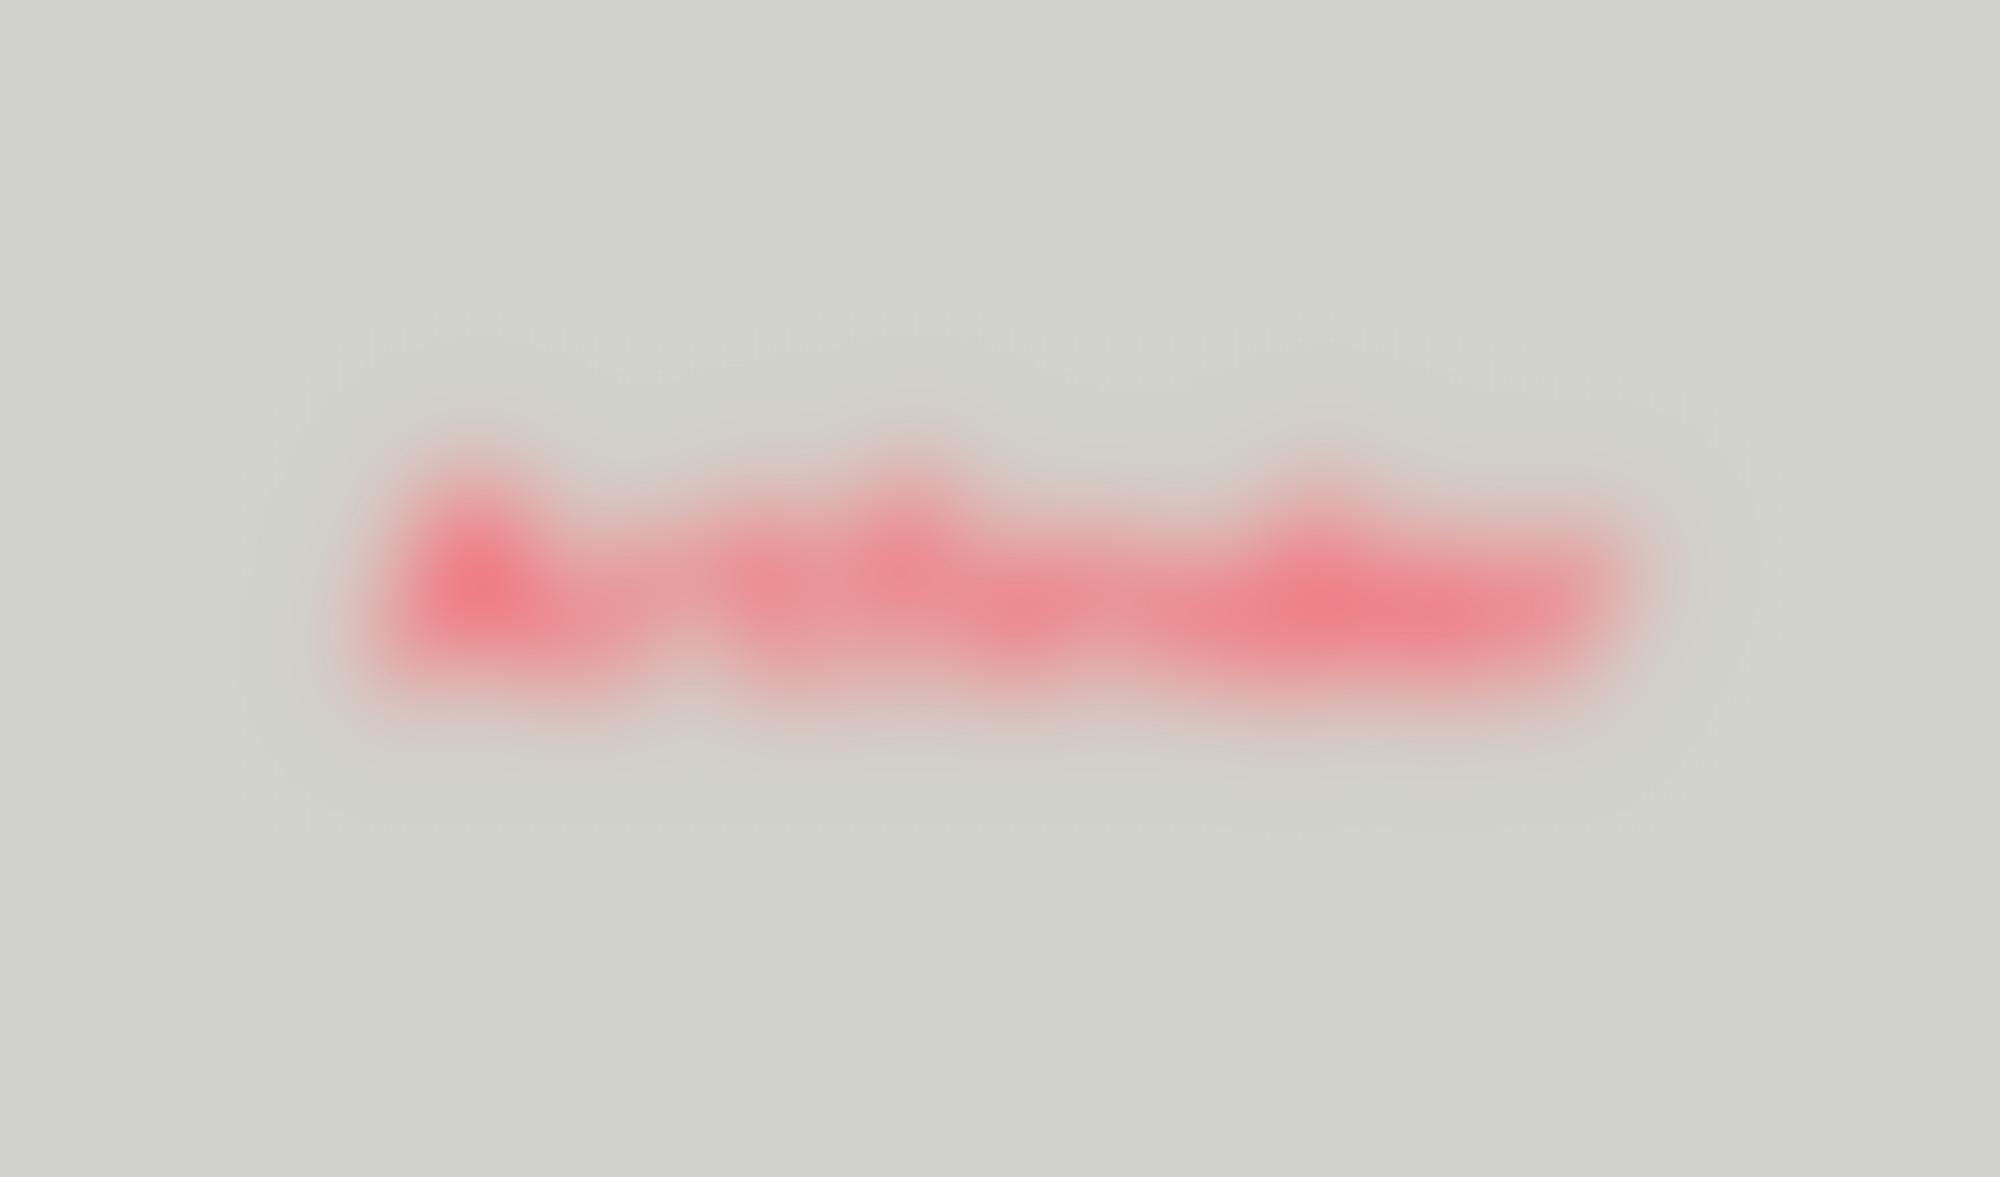 ARTF LIP 07 autocompressfitresizeixlibphp 1 1 0max h2000max w3 D2000q80sd71d8f3396d49610b5e23b06595368e2